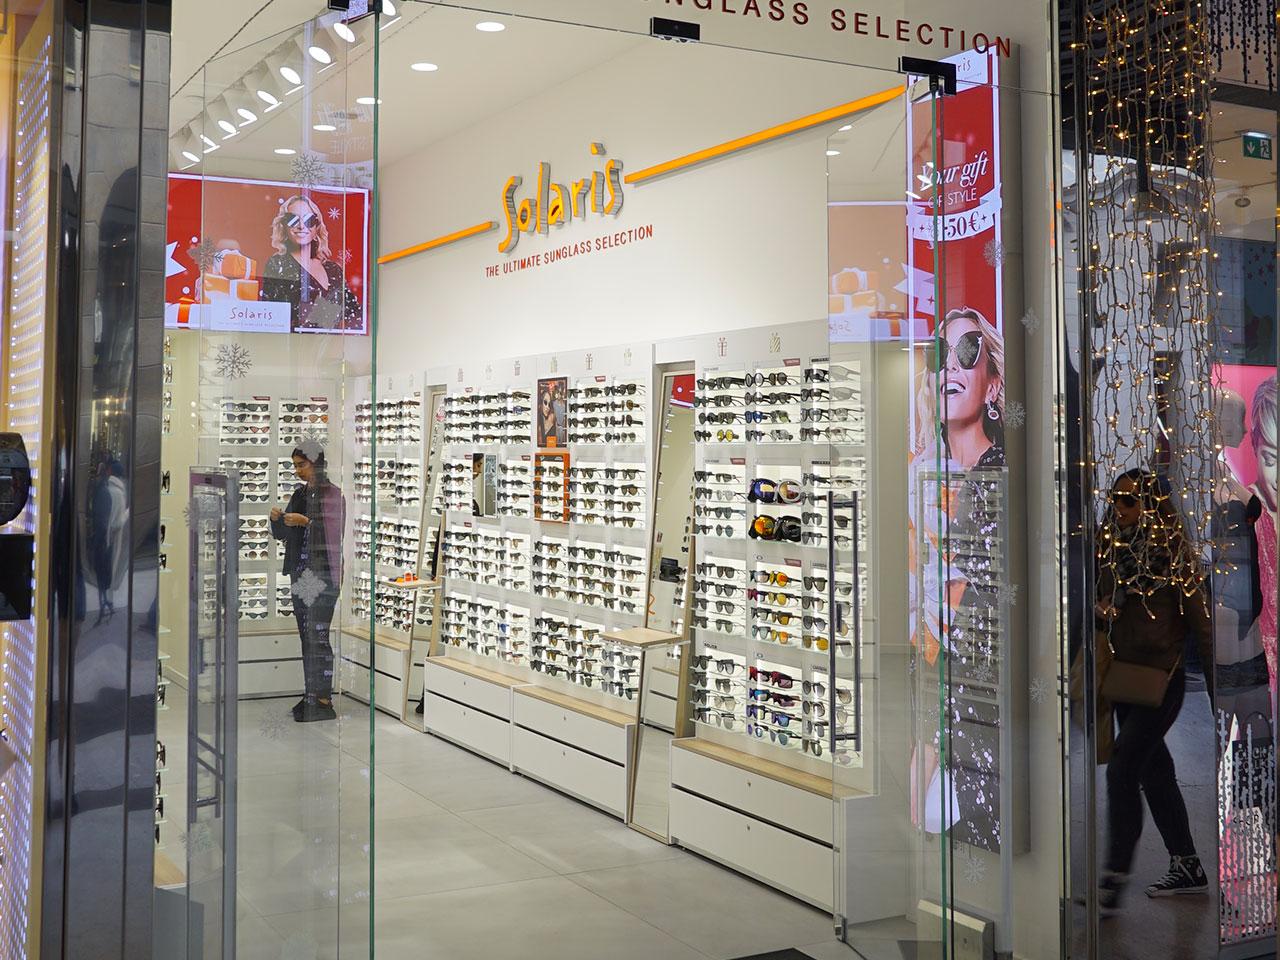 Solaris-ledwall-indoor-schermi-da-interni-fondo-store-retro-cassa-1280x960-4